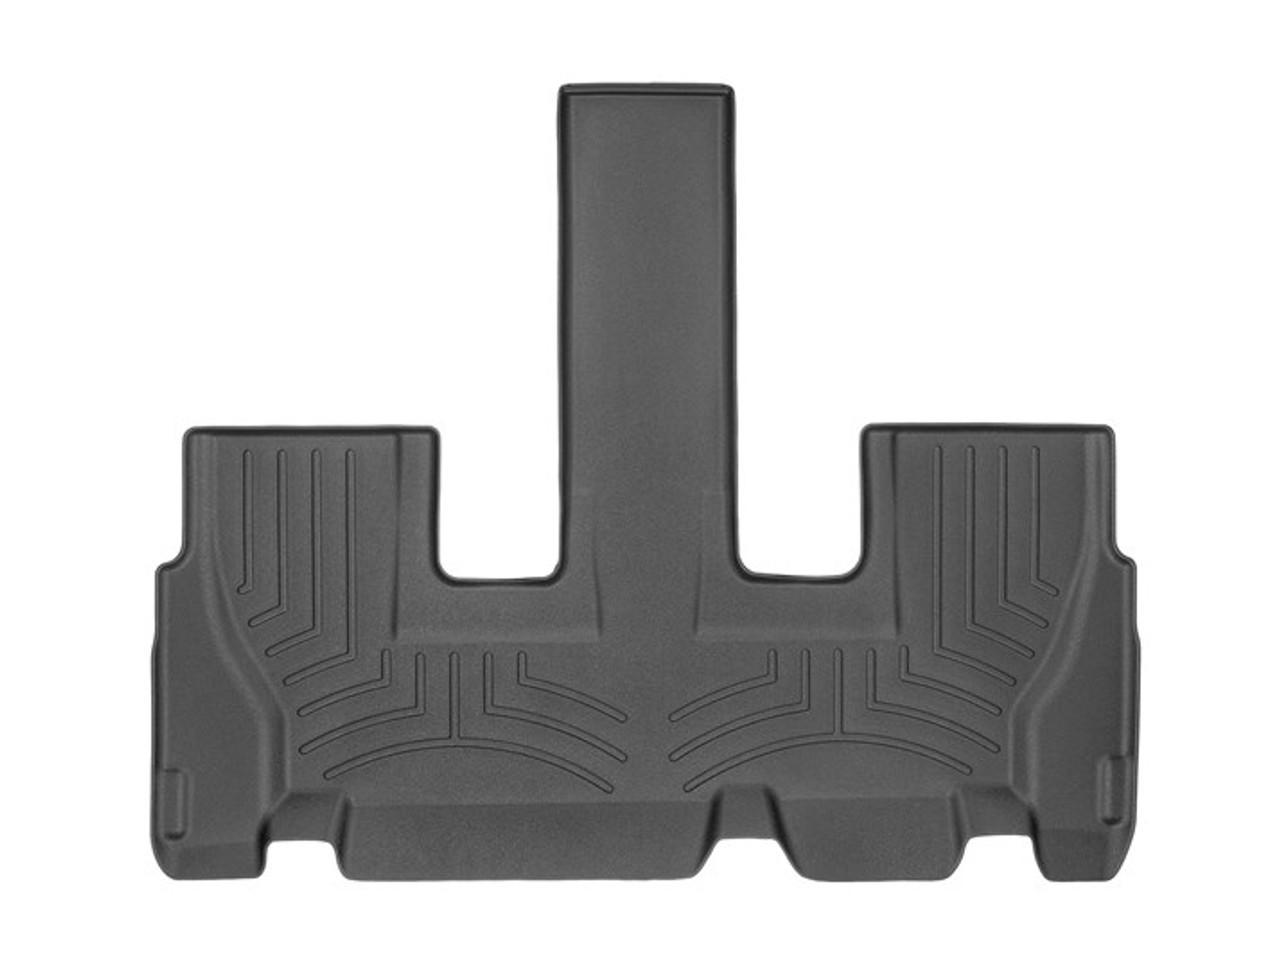 2020-2022 Hyundai Palisade WeatherTech Floor Liners- Third Row (Black)